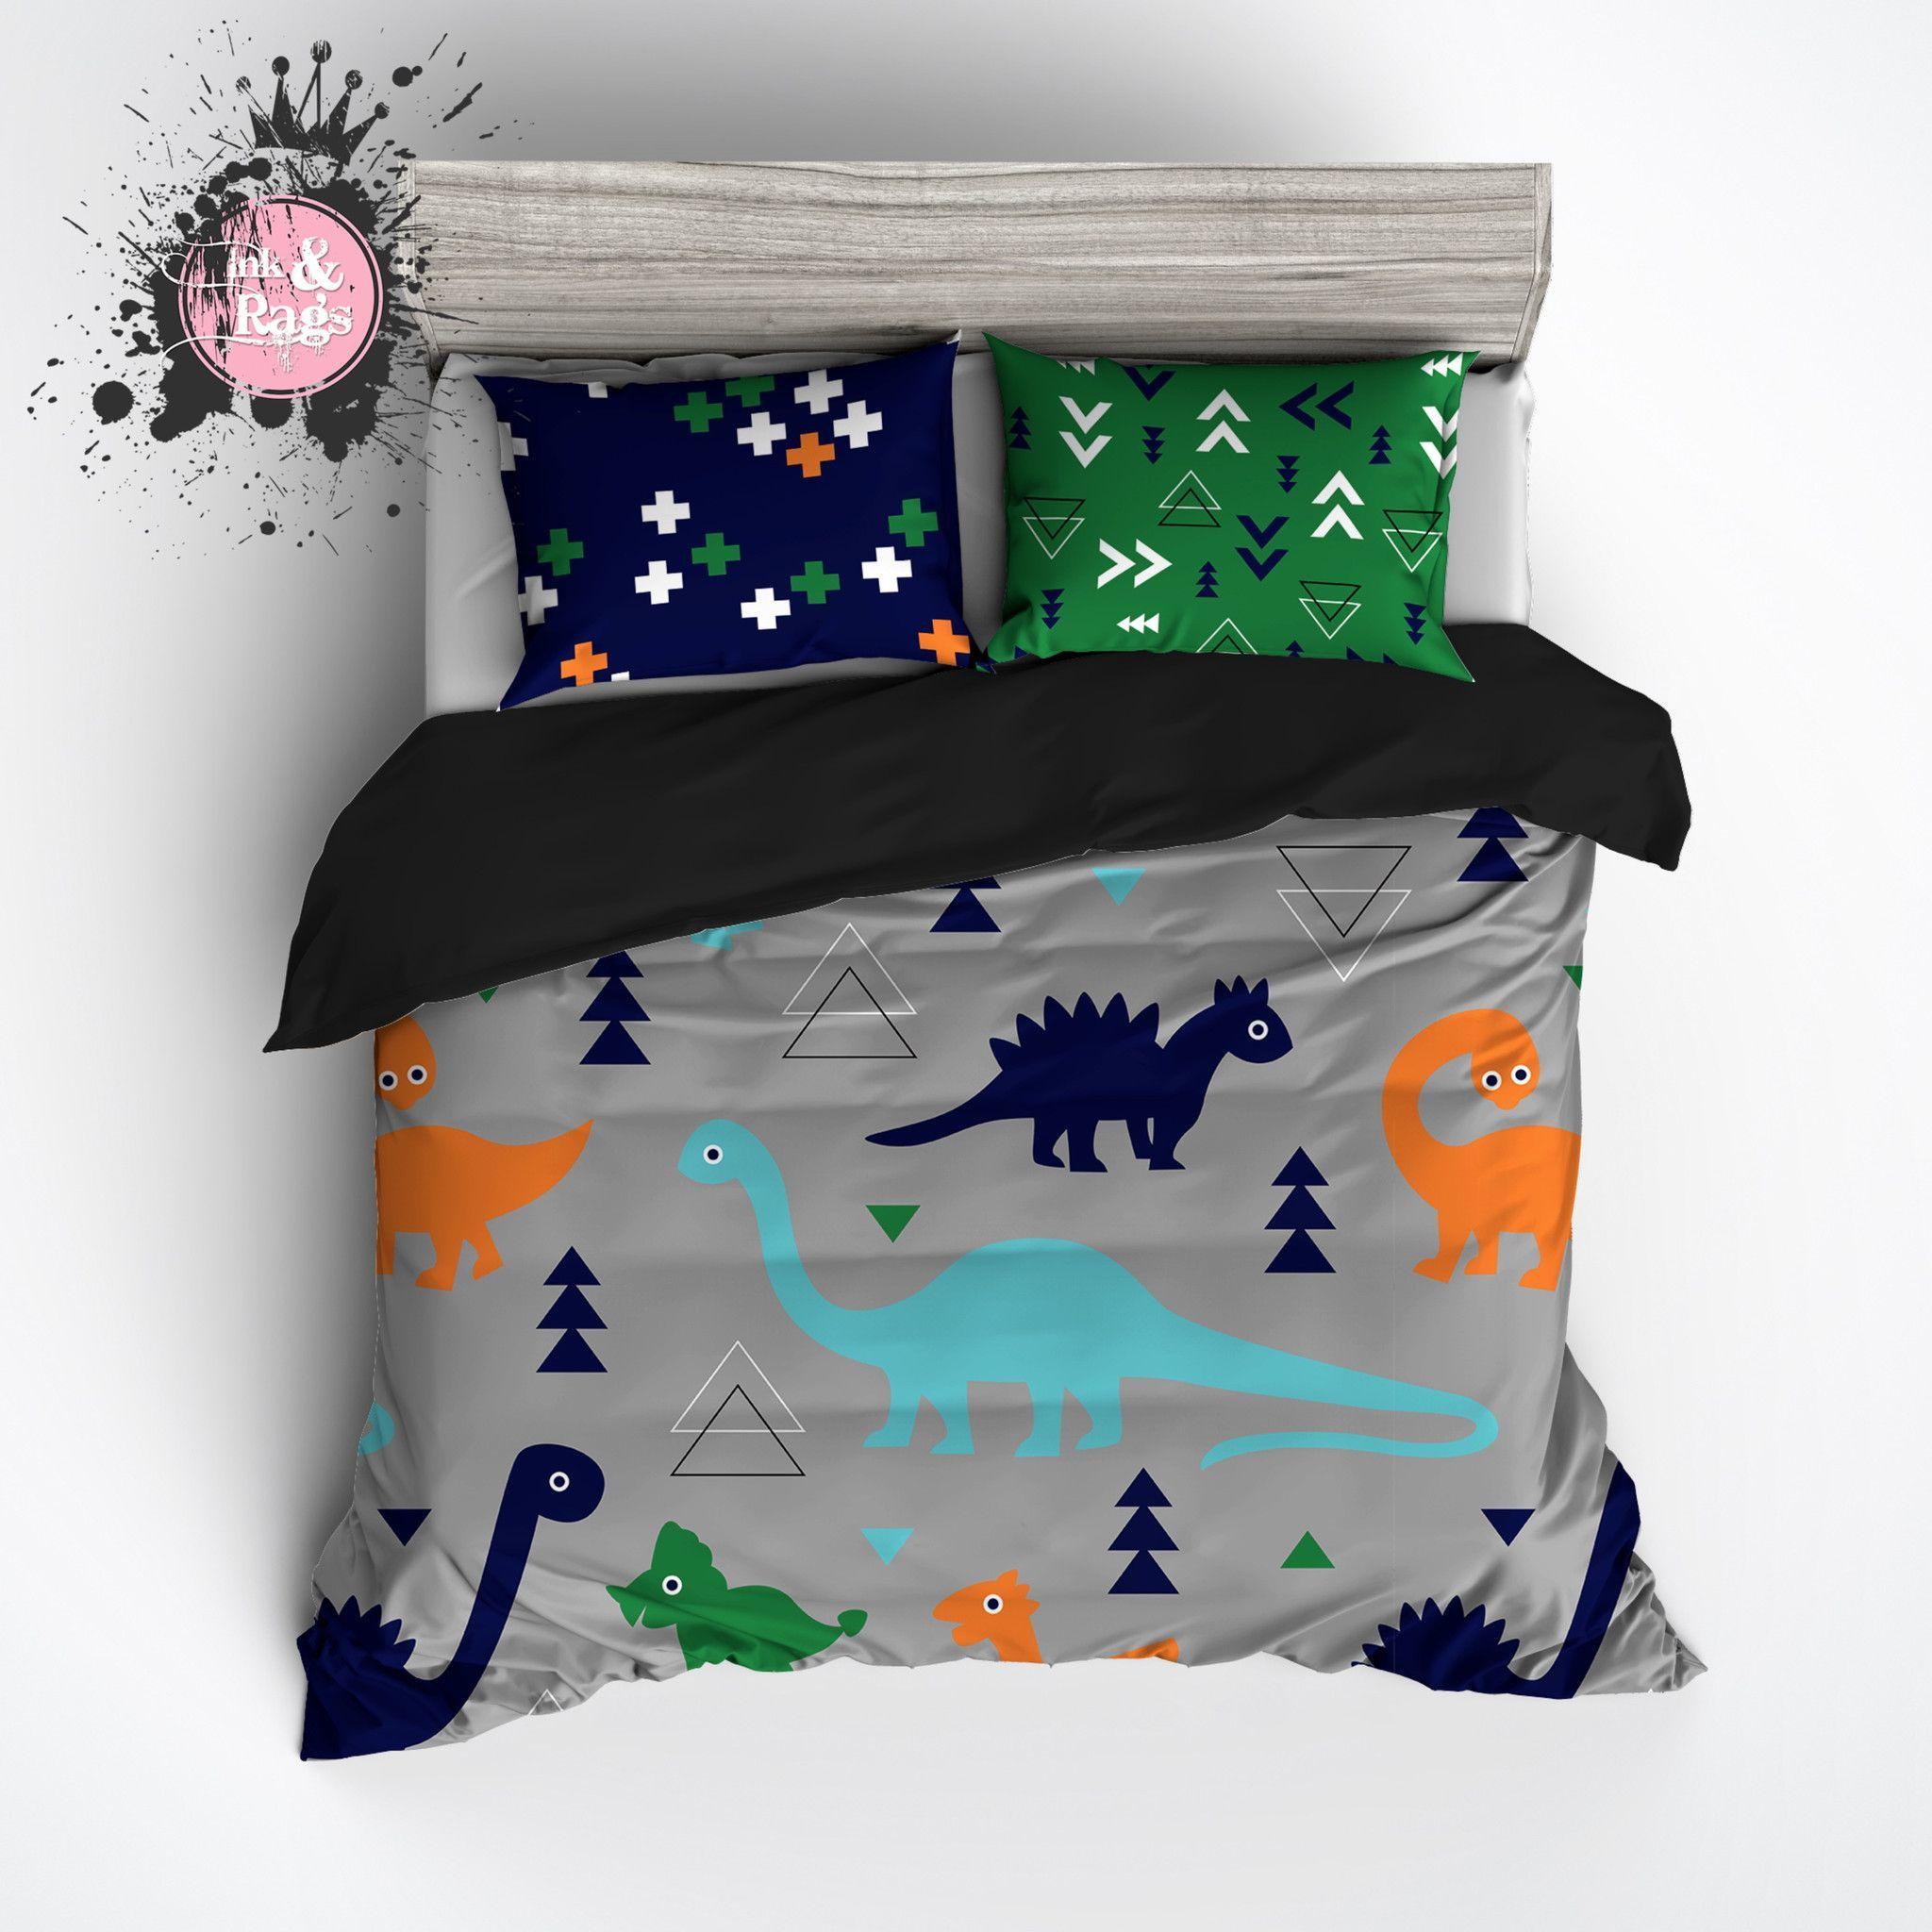 Bgo Geometric Dino Dinosaur Big Kids Bedding Collection Duvet Bedding Sets Duvet Bedding Toddler Bed Boy